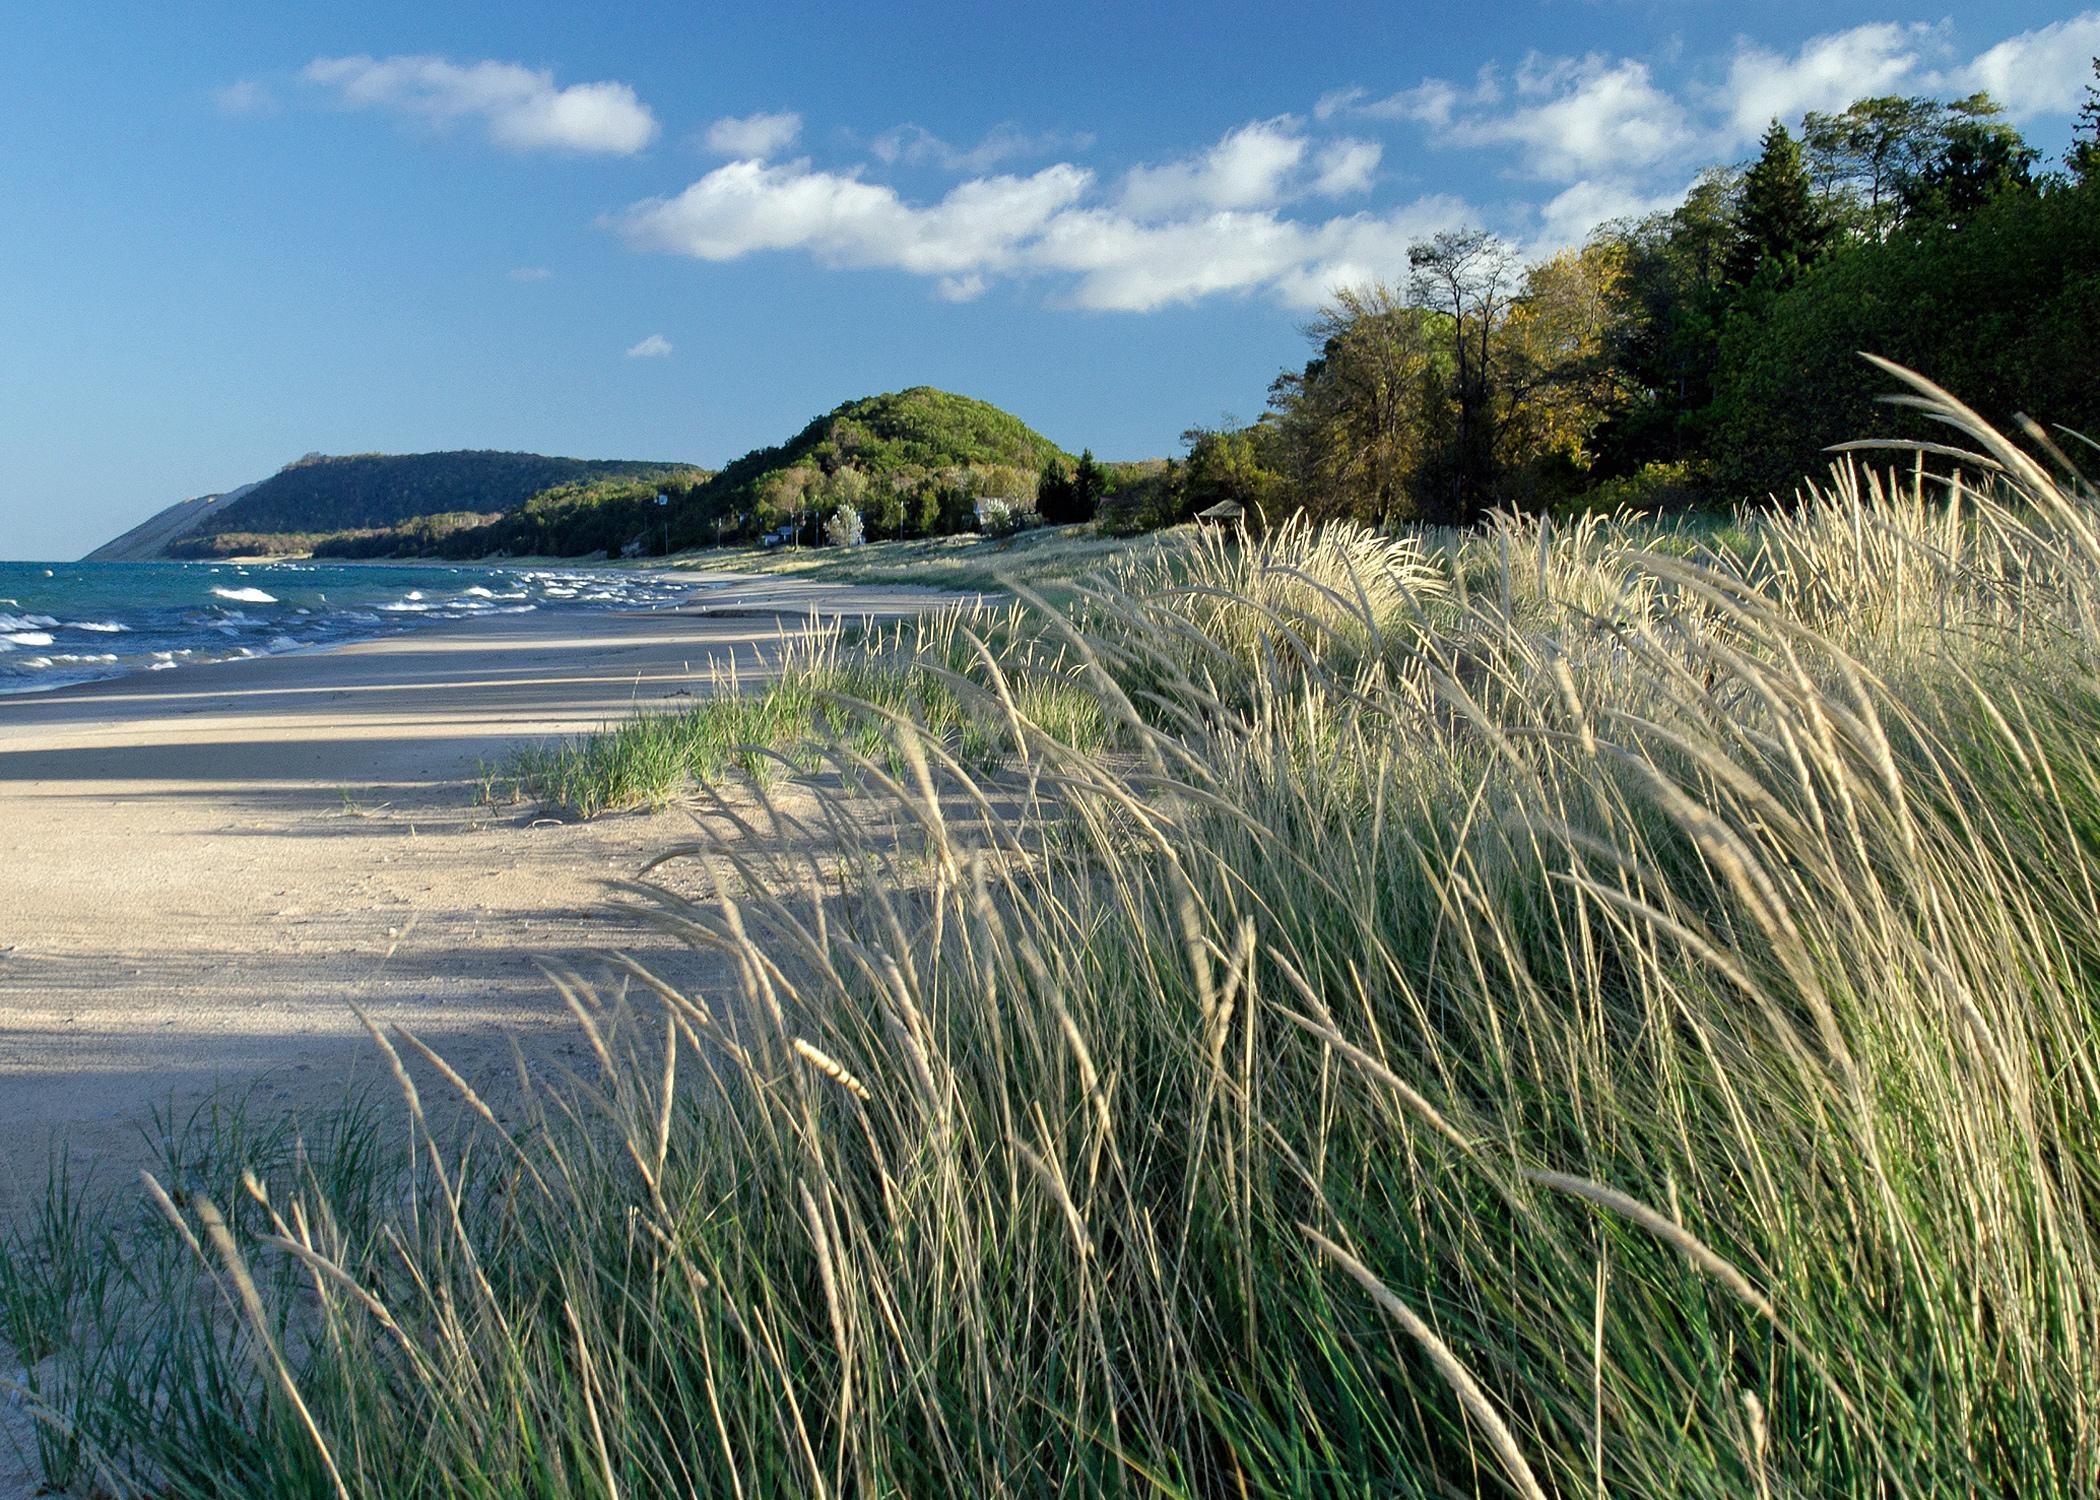 The beach at Empire